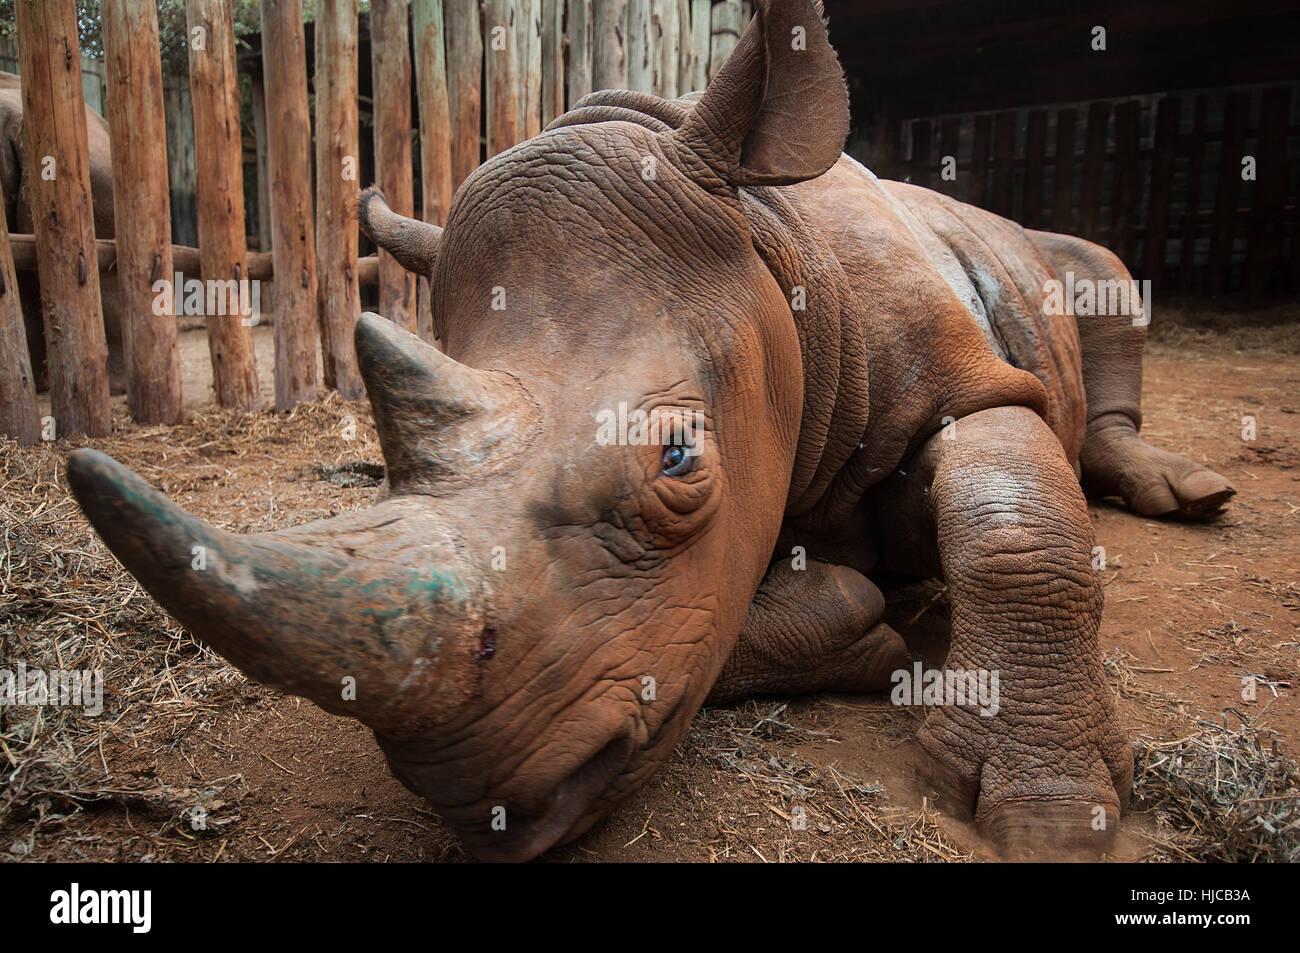 Rhino orphelin dans un abri de secours, Nairobi, Kenya Banque D'Images